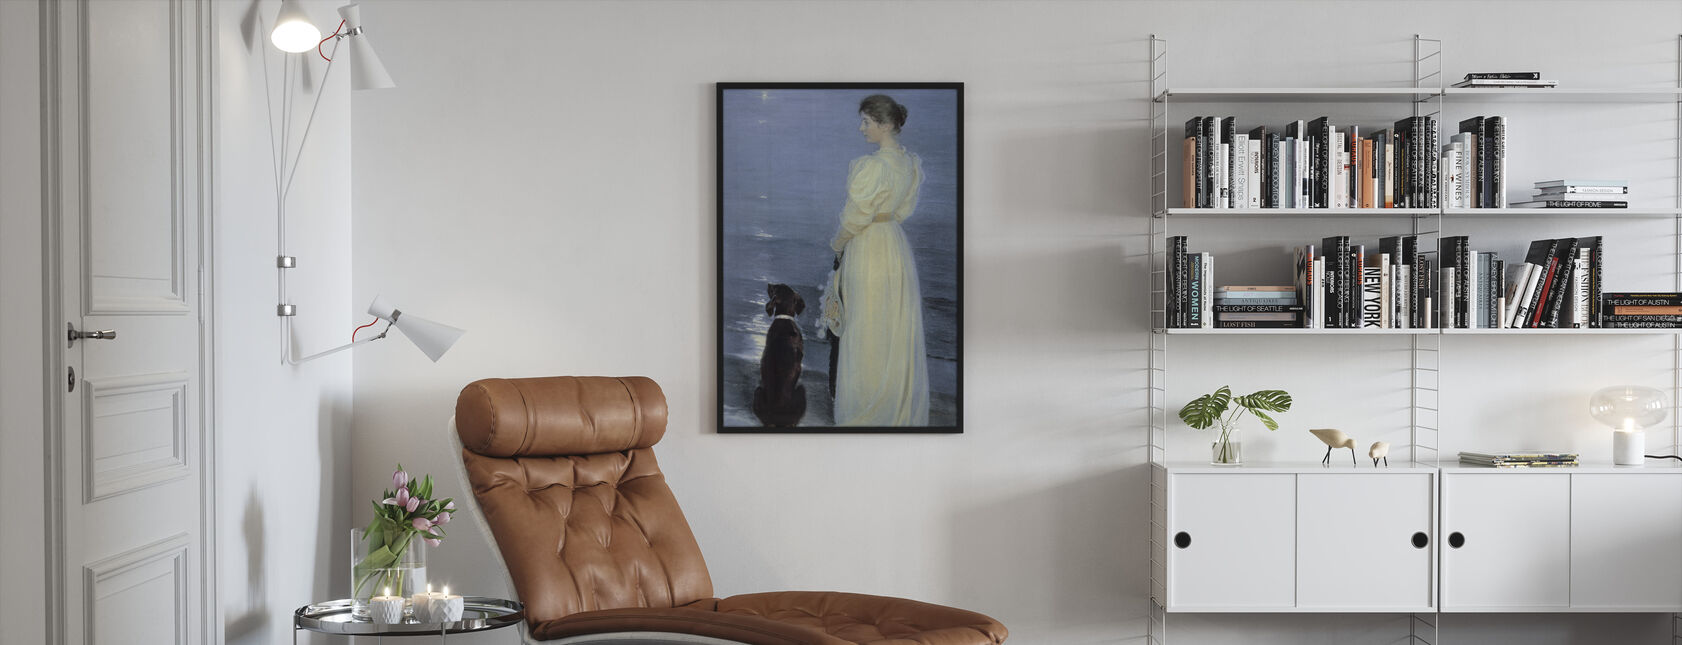 Summer Evening at Skagen - Peder Severin Kroyer, - Framed print - Living Room